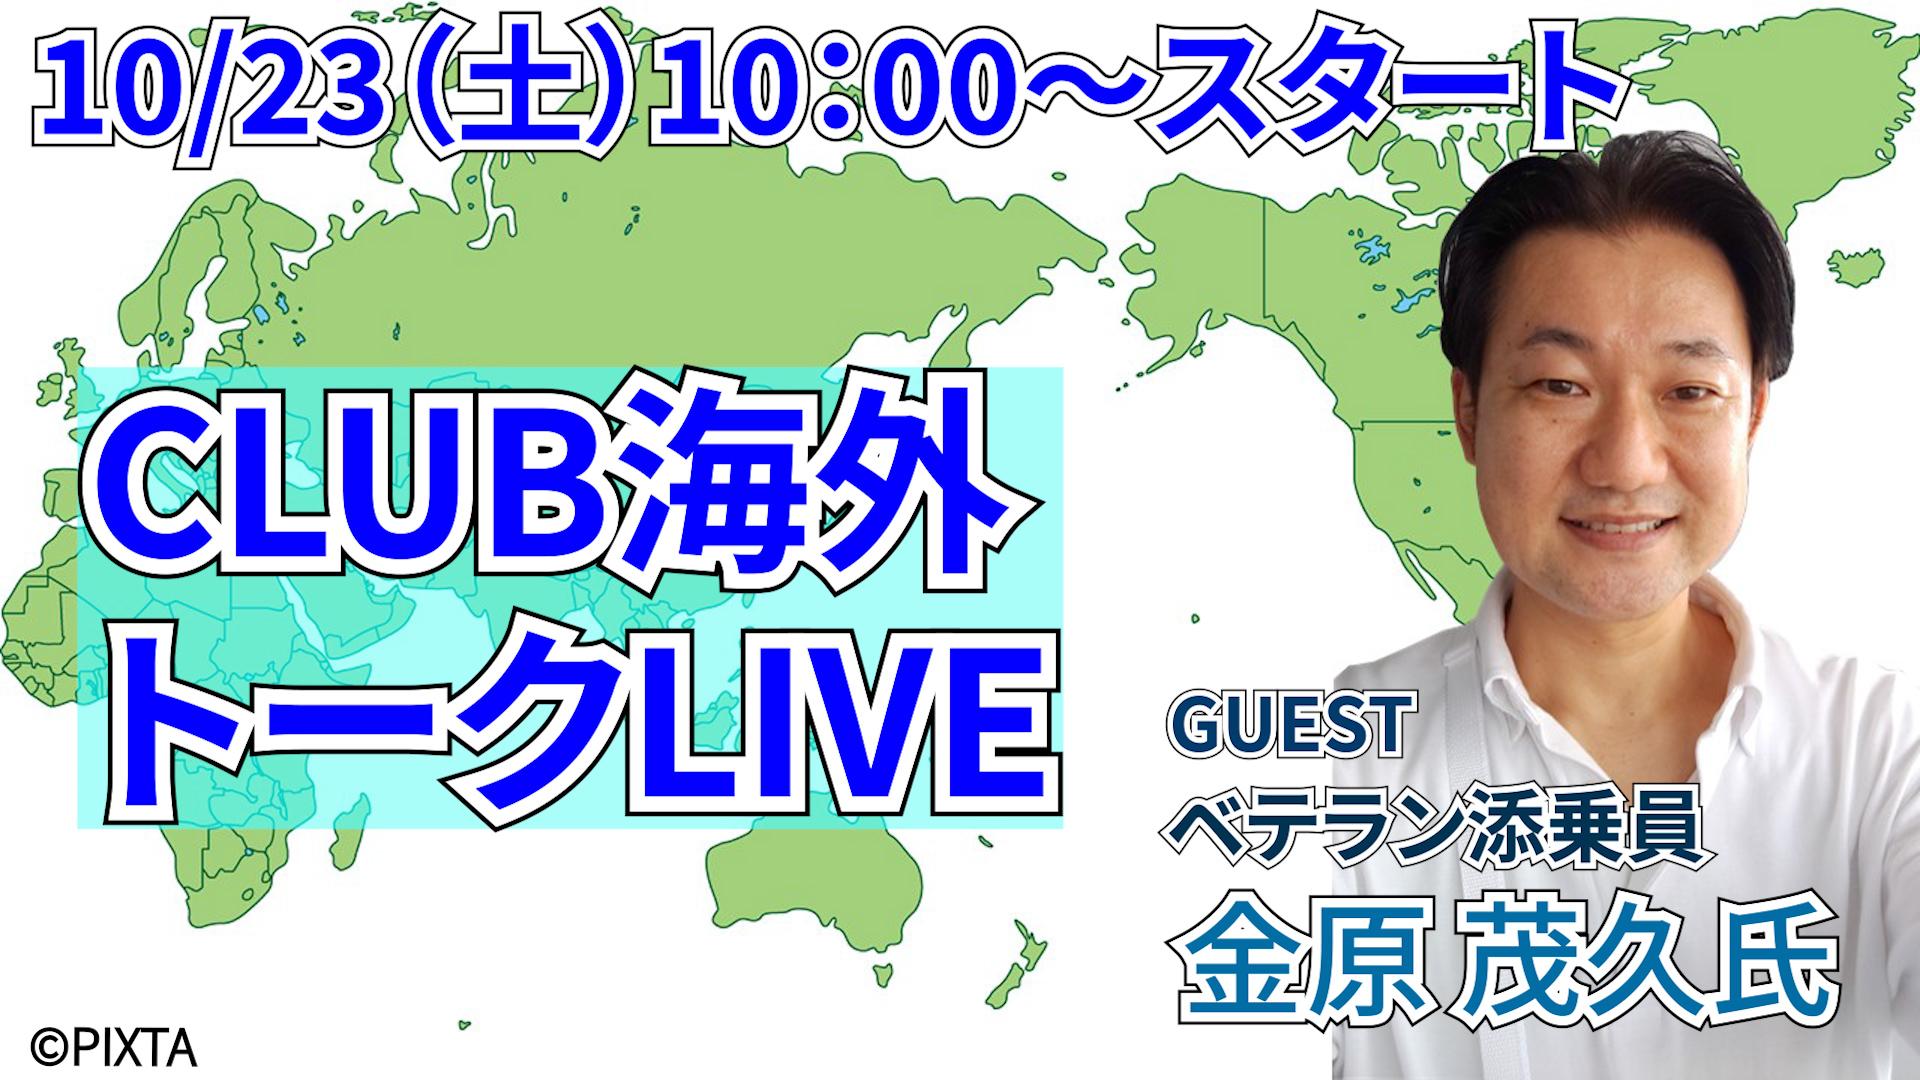 【CLUB海外】10/23(土)10:00~『世界10カ国を一挙のぞき見!世界85カ国を訪れたベテラン添乗員による本音トークLIVE』